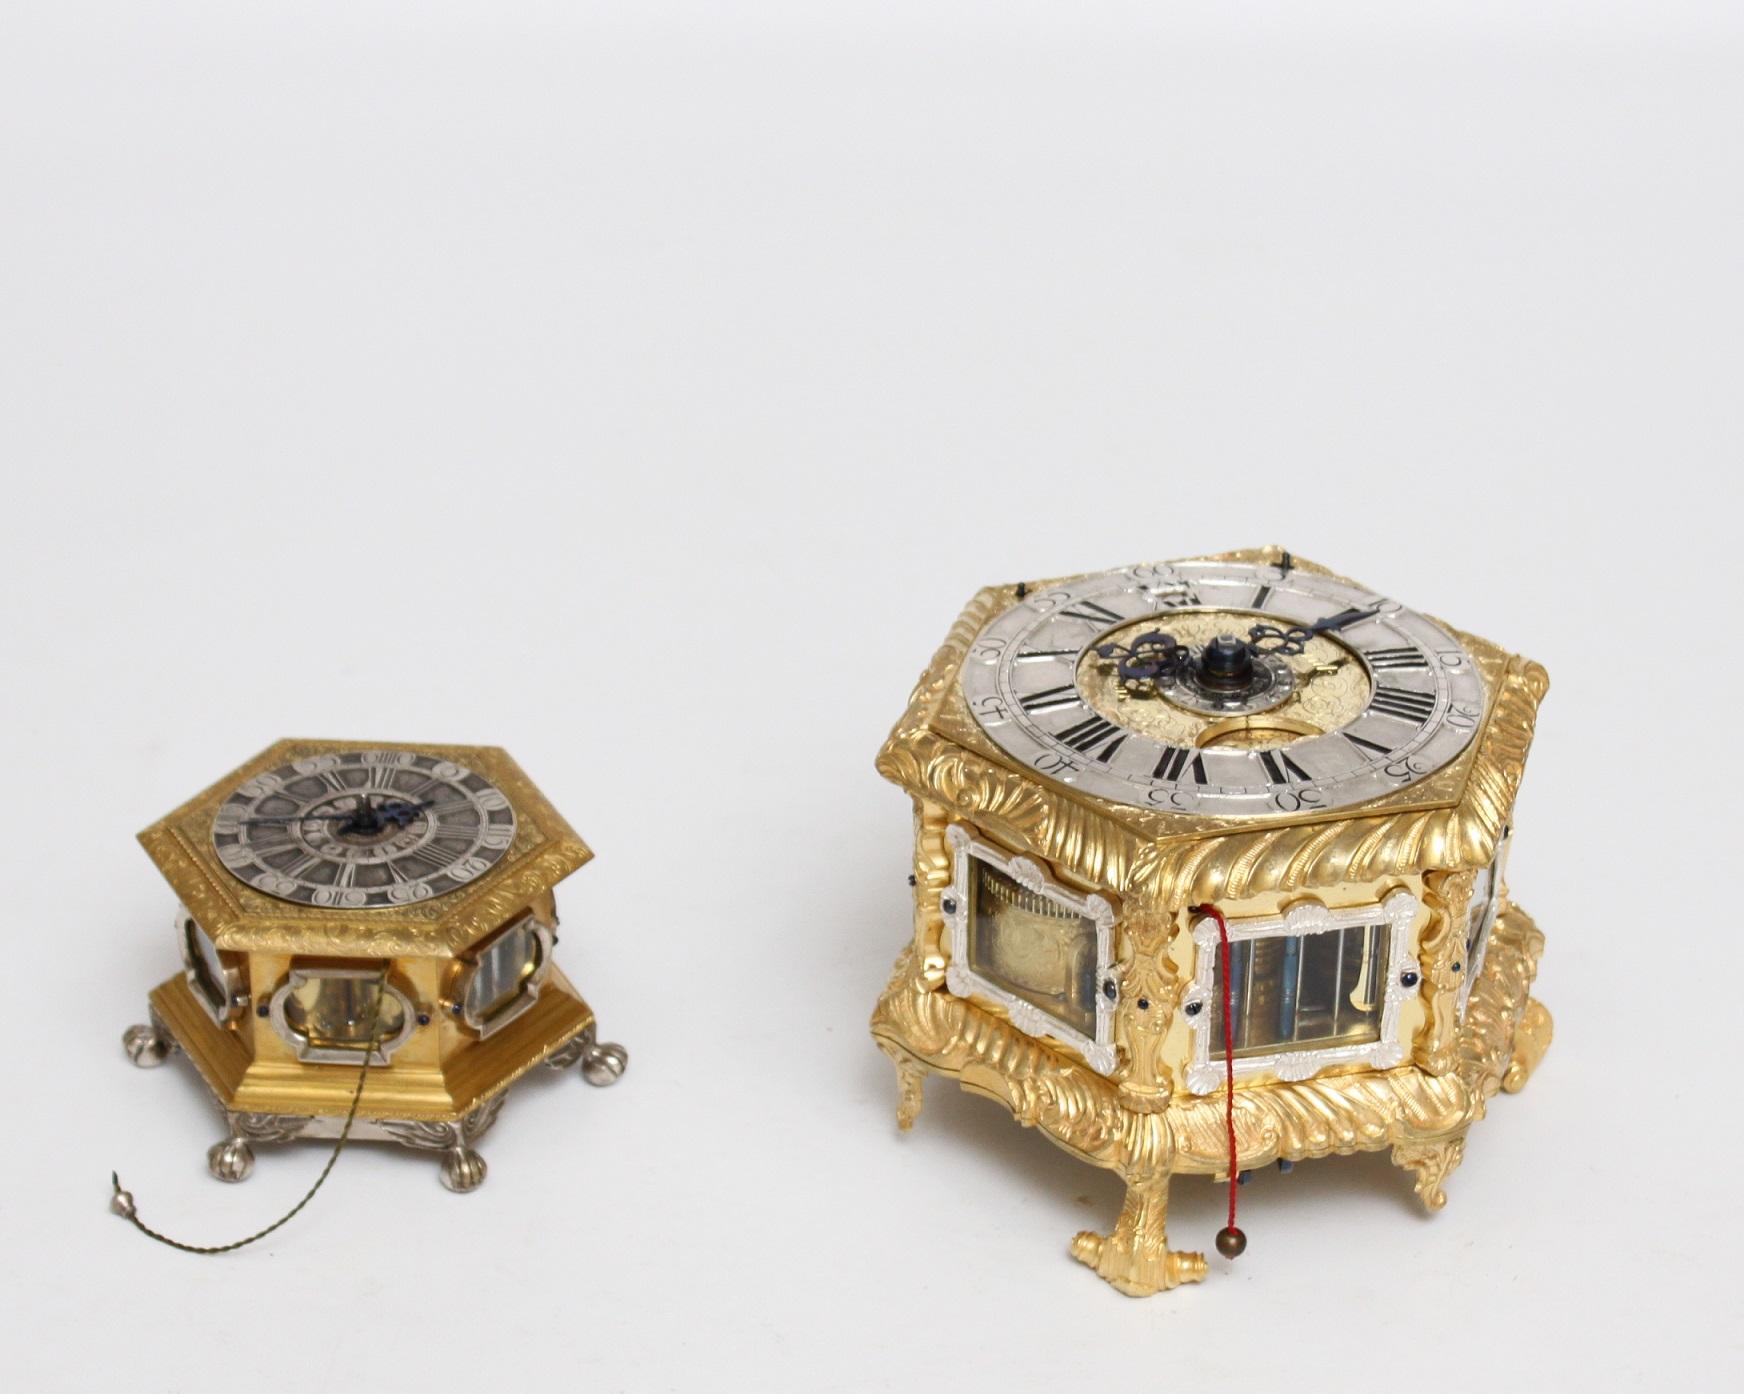 German-gilt brass-hexagonal-quarter striking-table clock-engraved-alarm-repeating